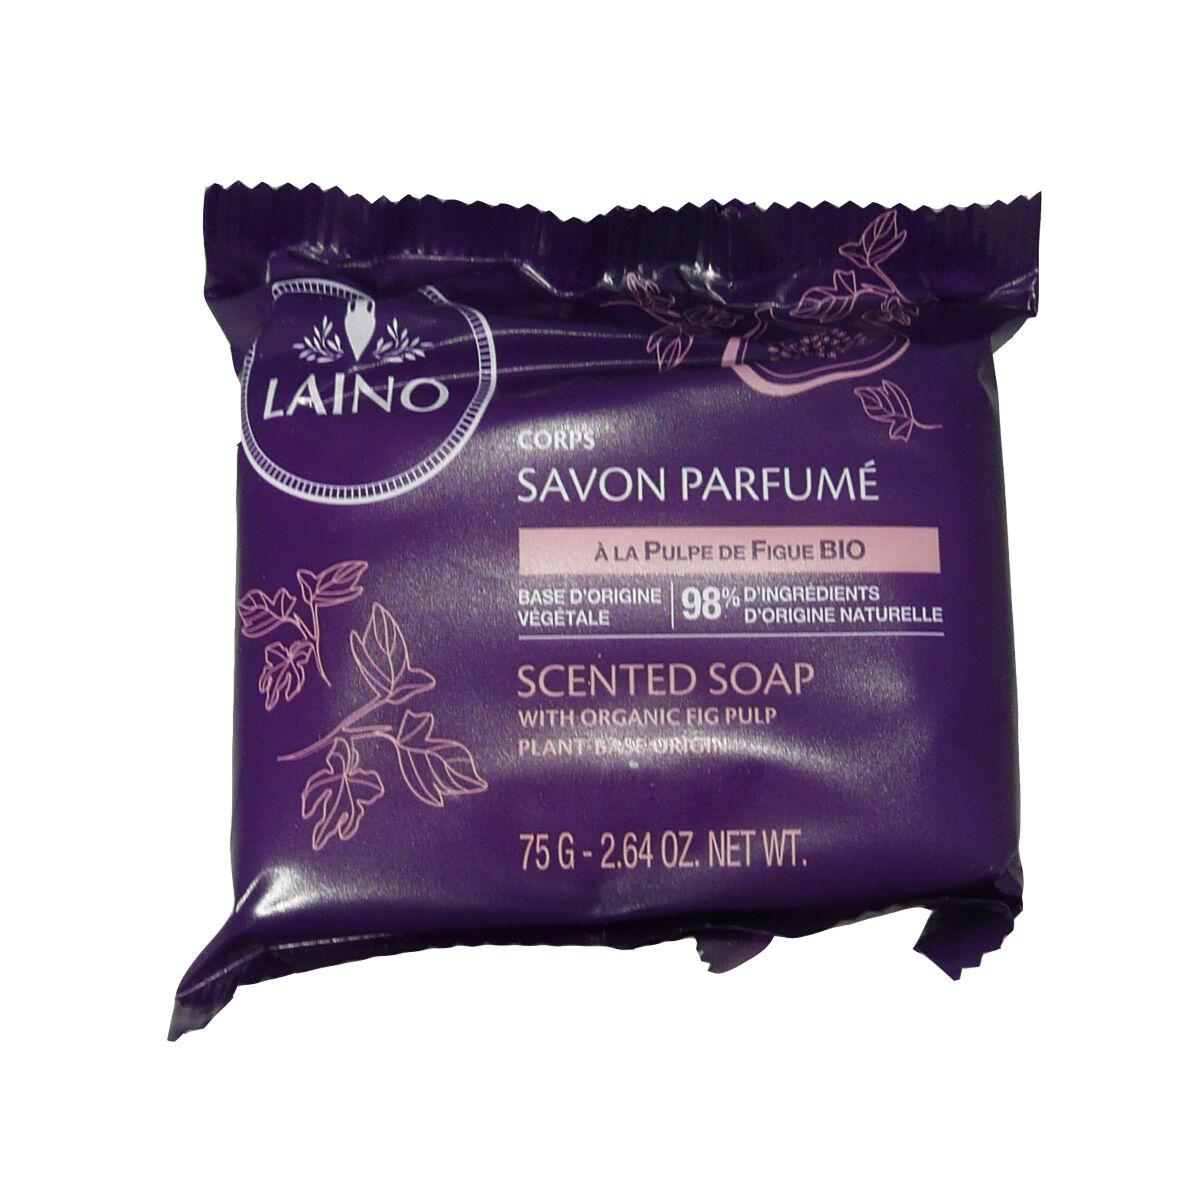 Laino savon parfume a la pulpe de figue bio 75 g